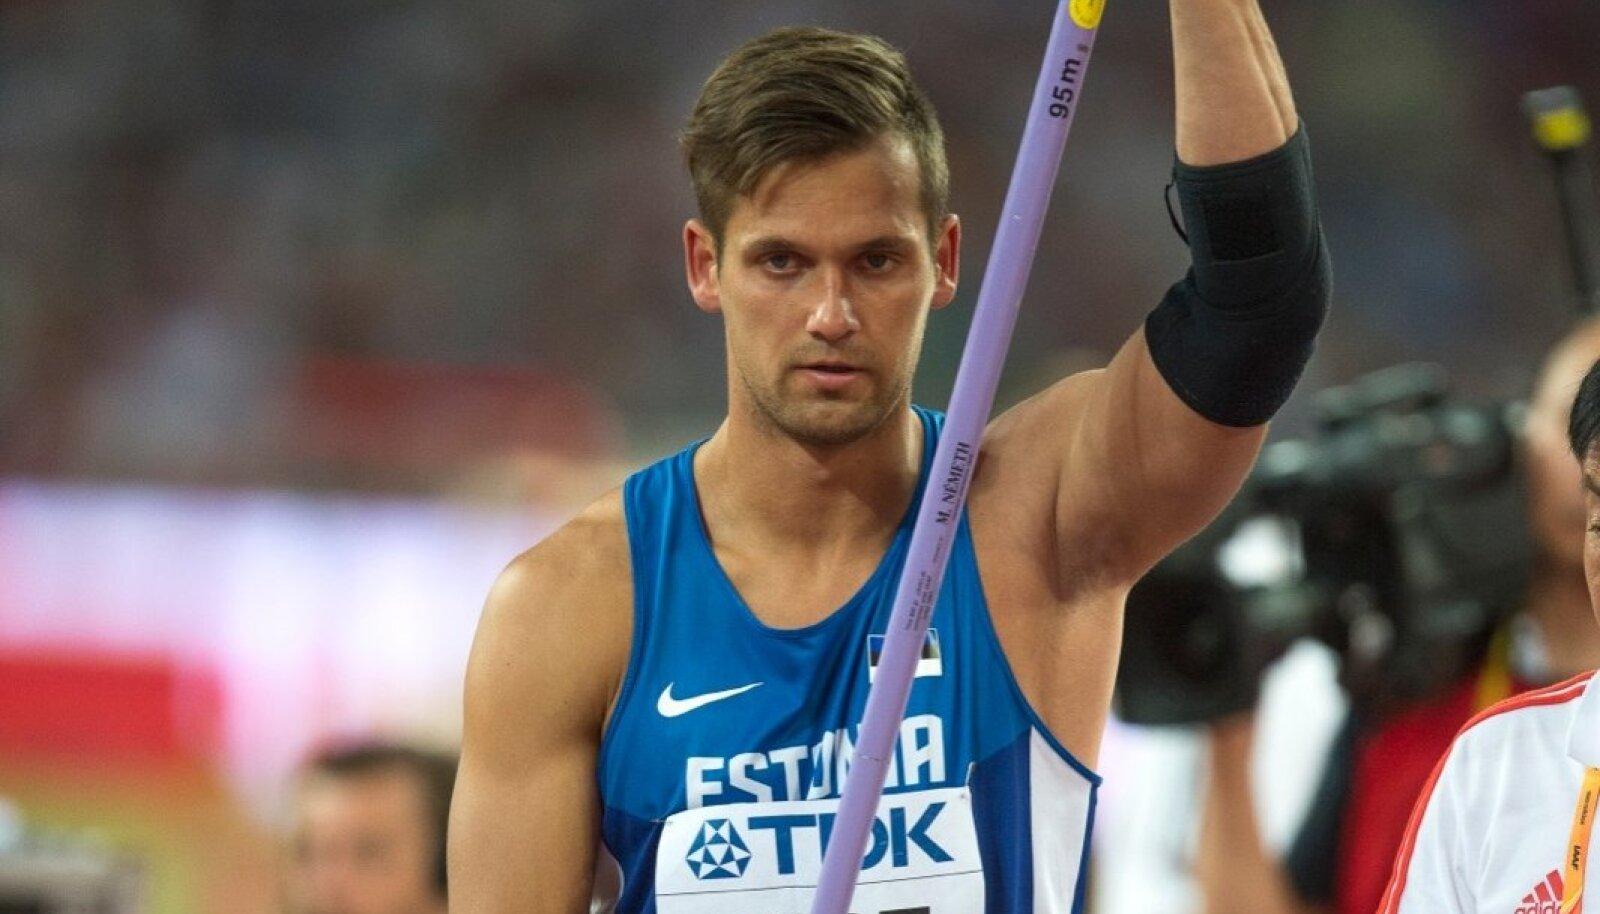 Magnus Kirt